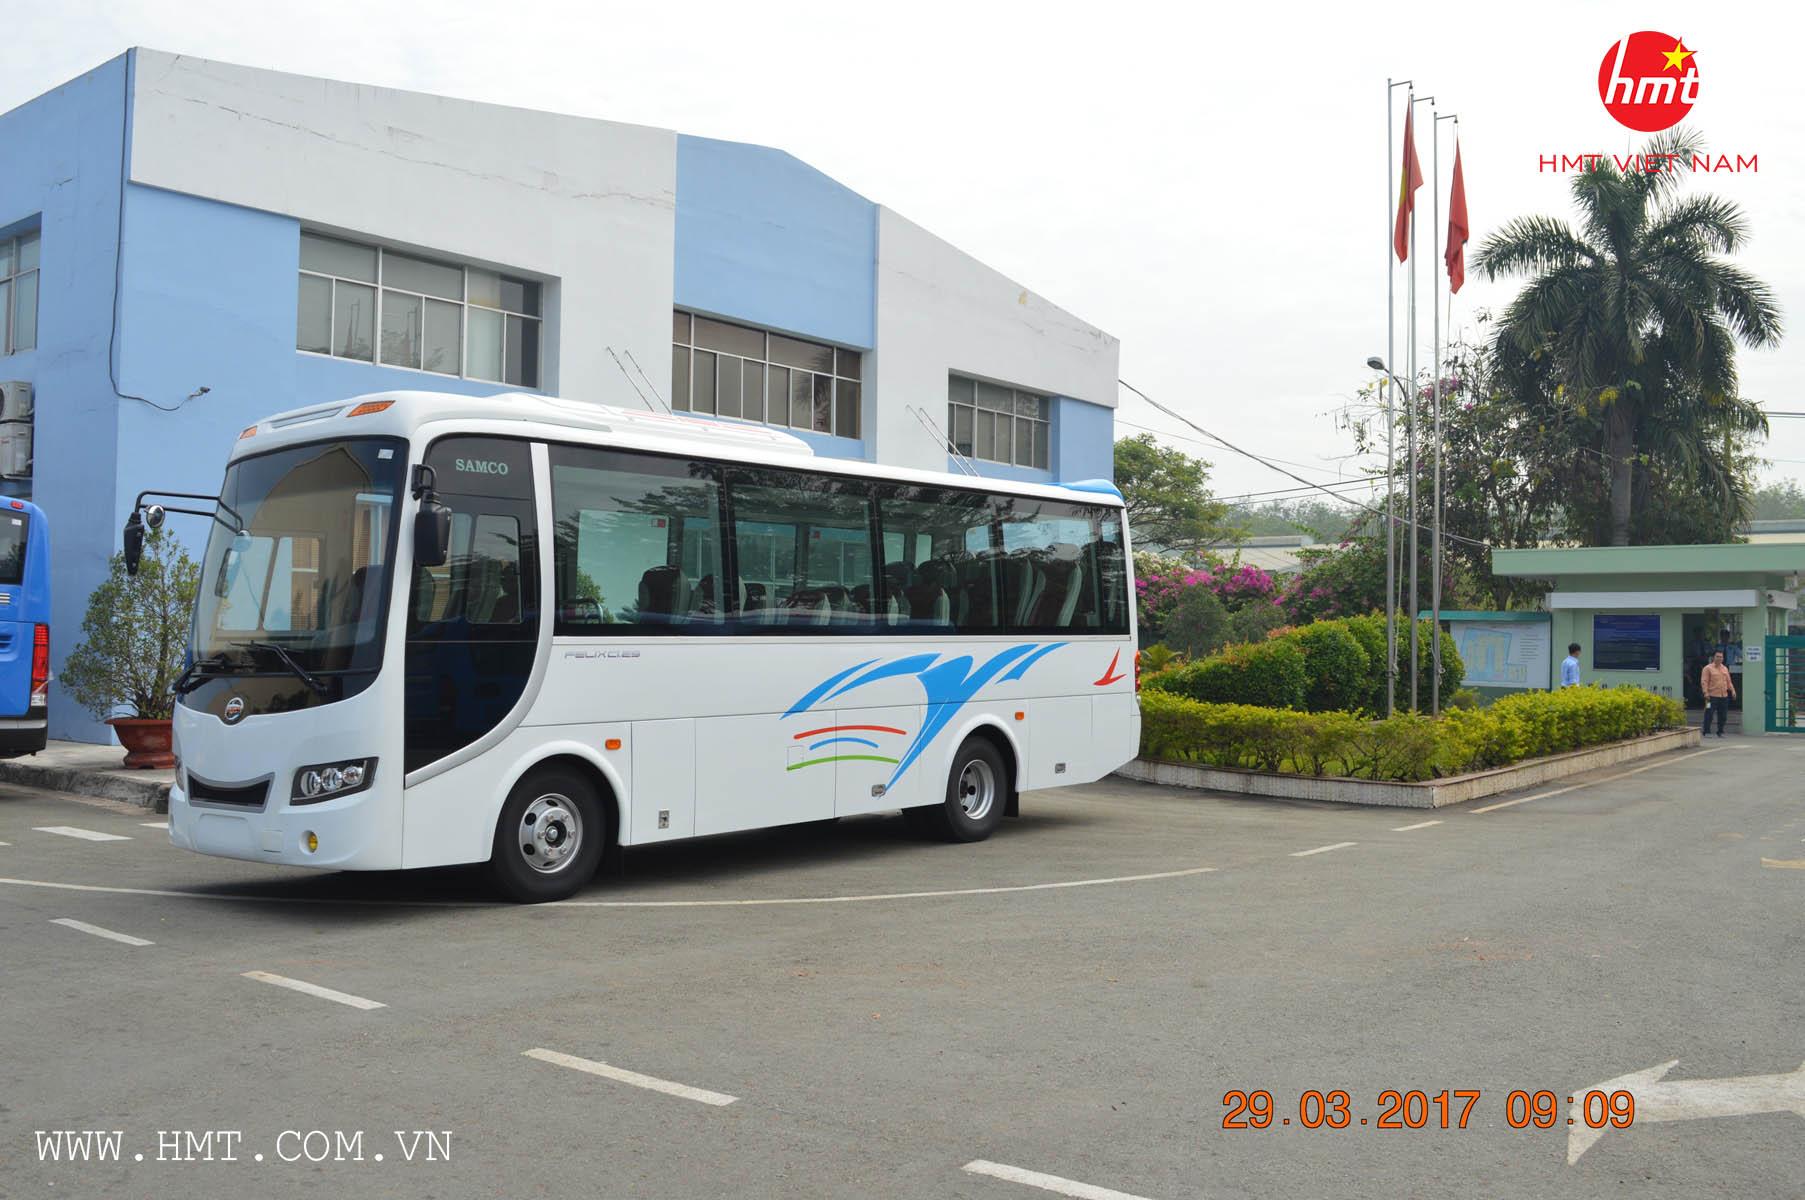 hmt-samco-felix-2934-ci-model-2017-3